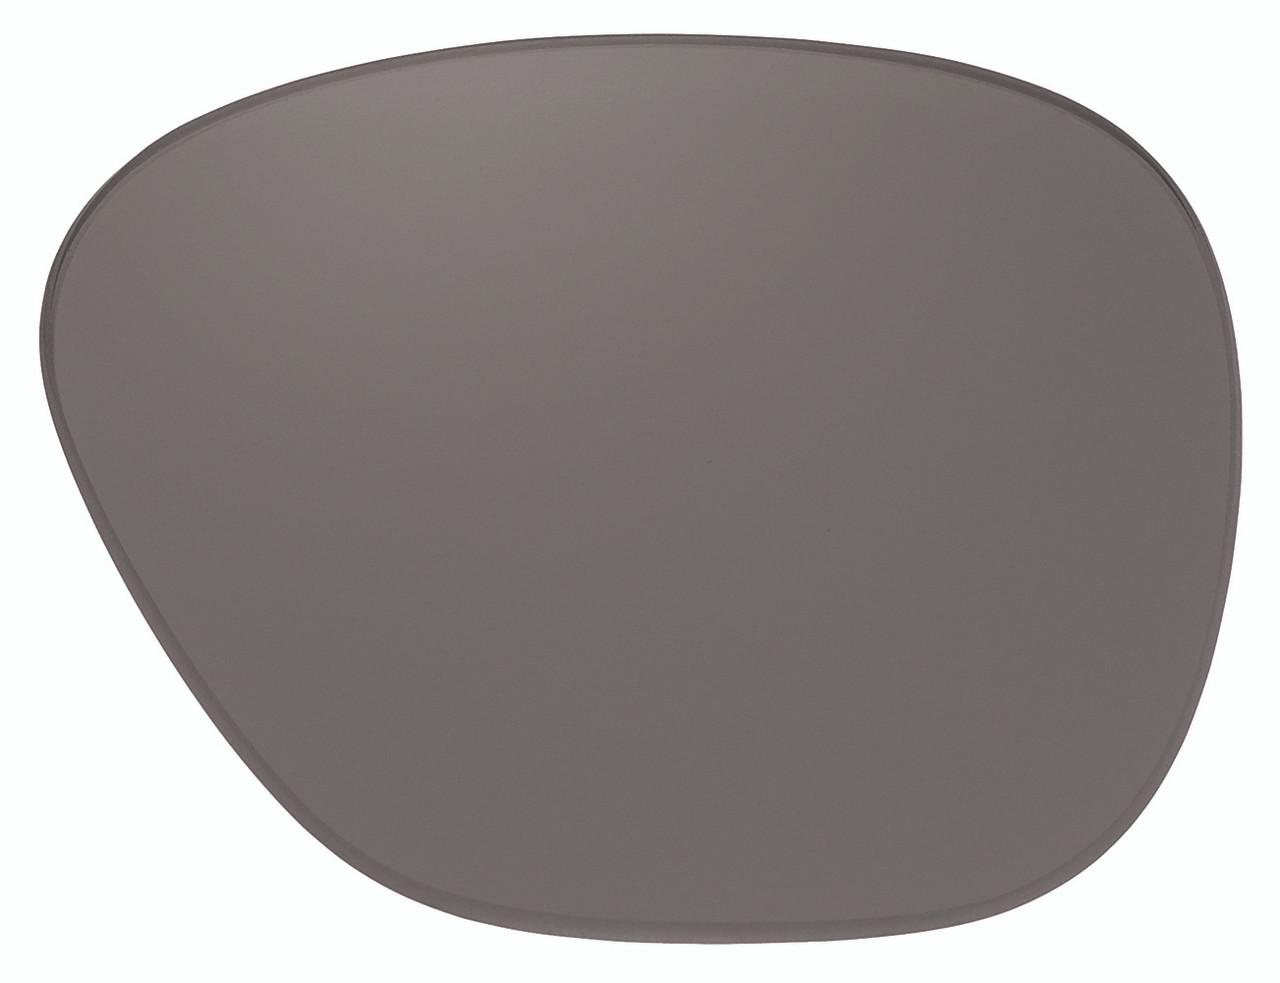 c275532e02 Suncloud Tailgate Replacement Lenses - Polarized World